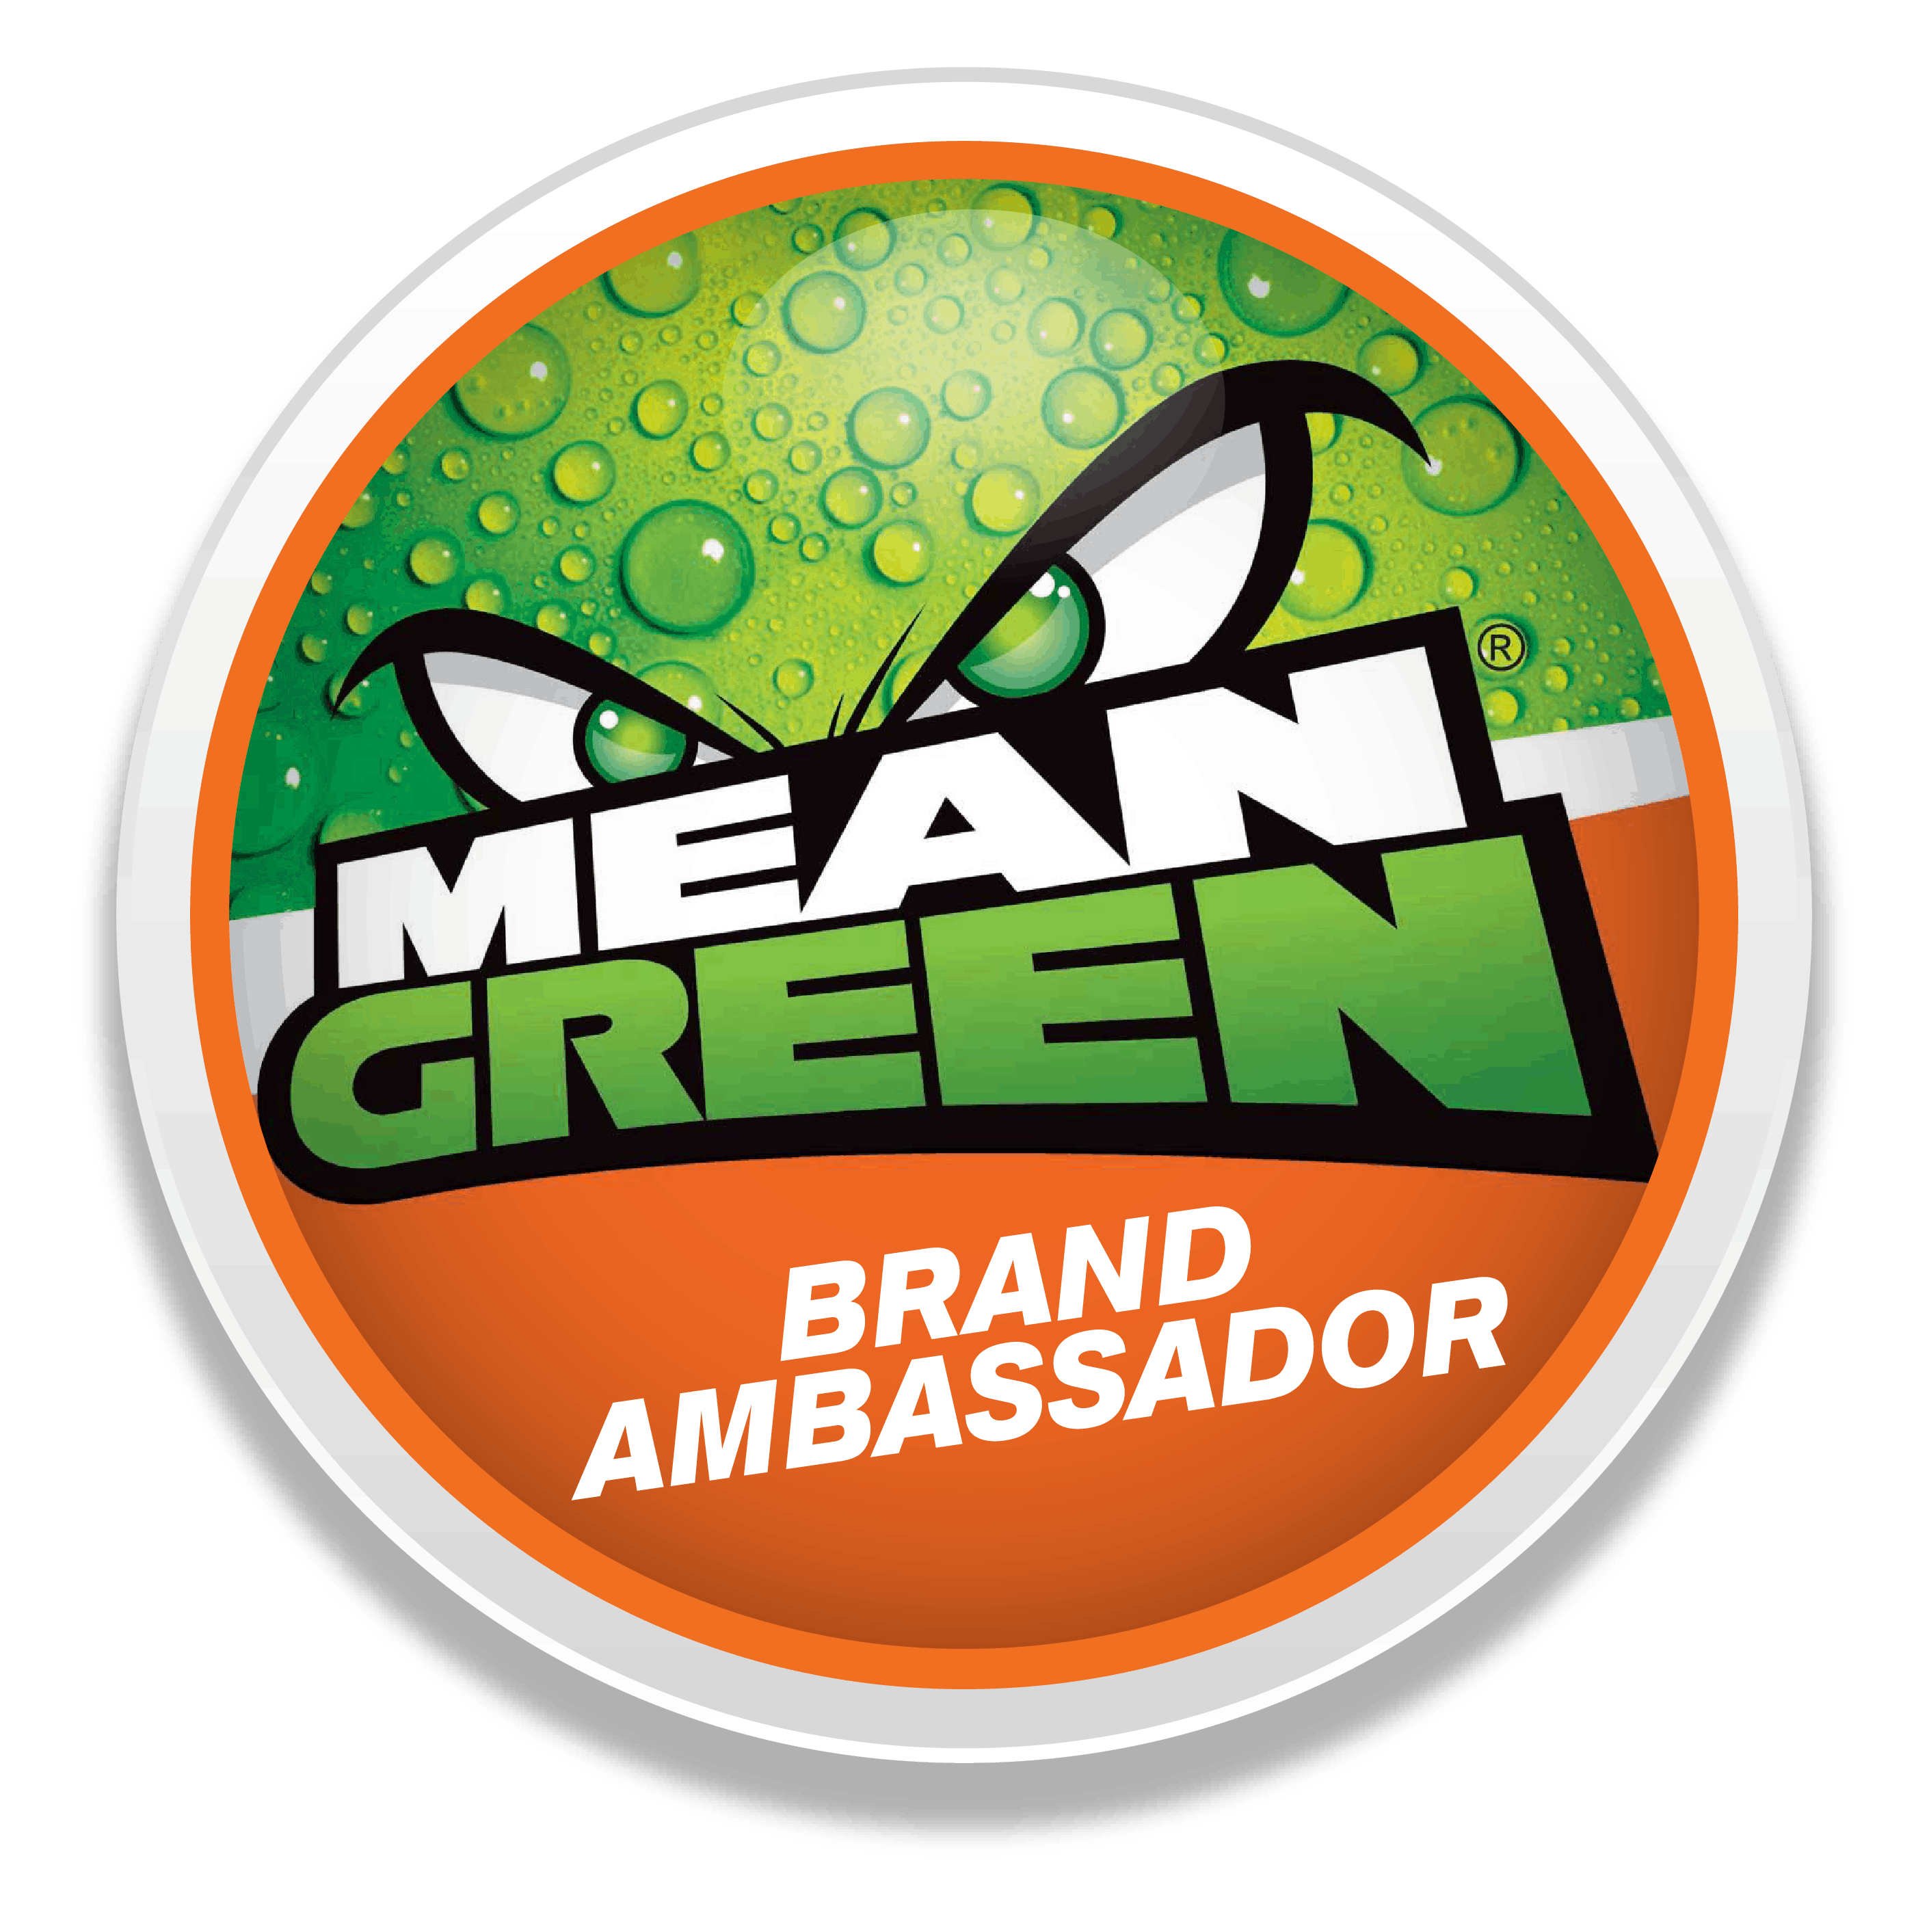 Mean Green Ambassador